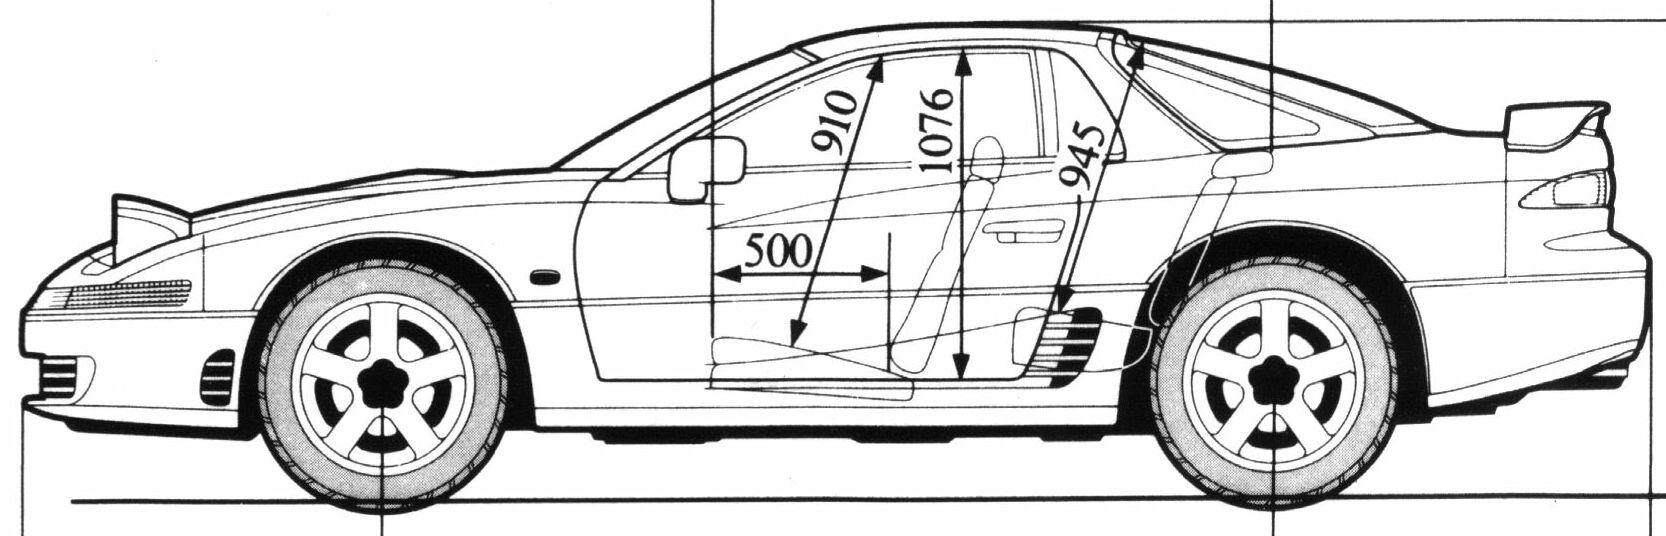 Mitsubishi GTO blueprint